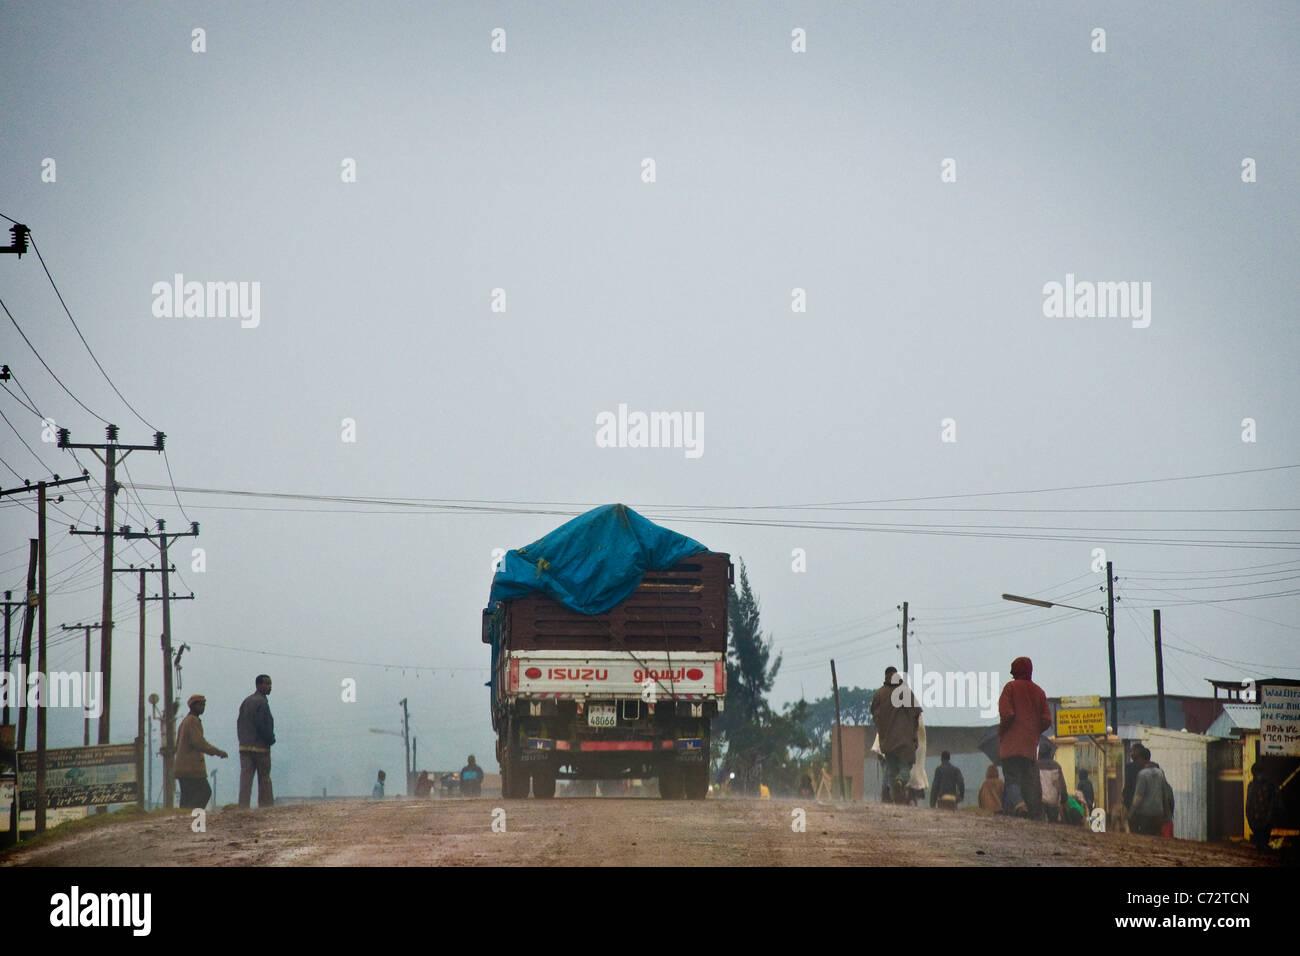 On the road, Surrounding of Awasa, Ethiopia - Stock Image